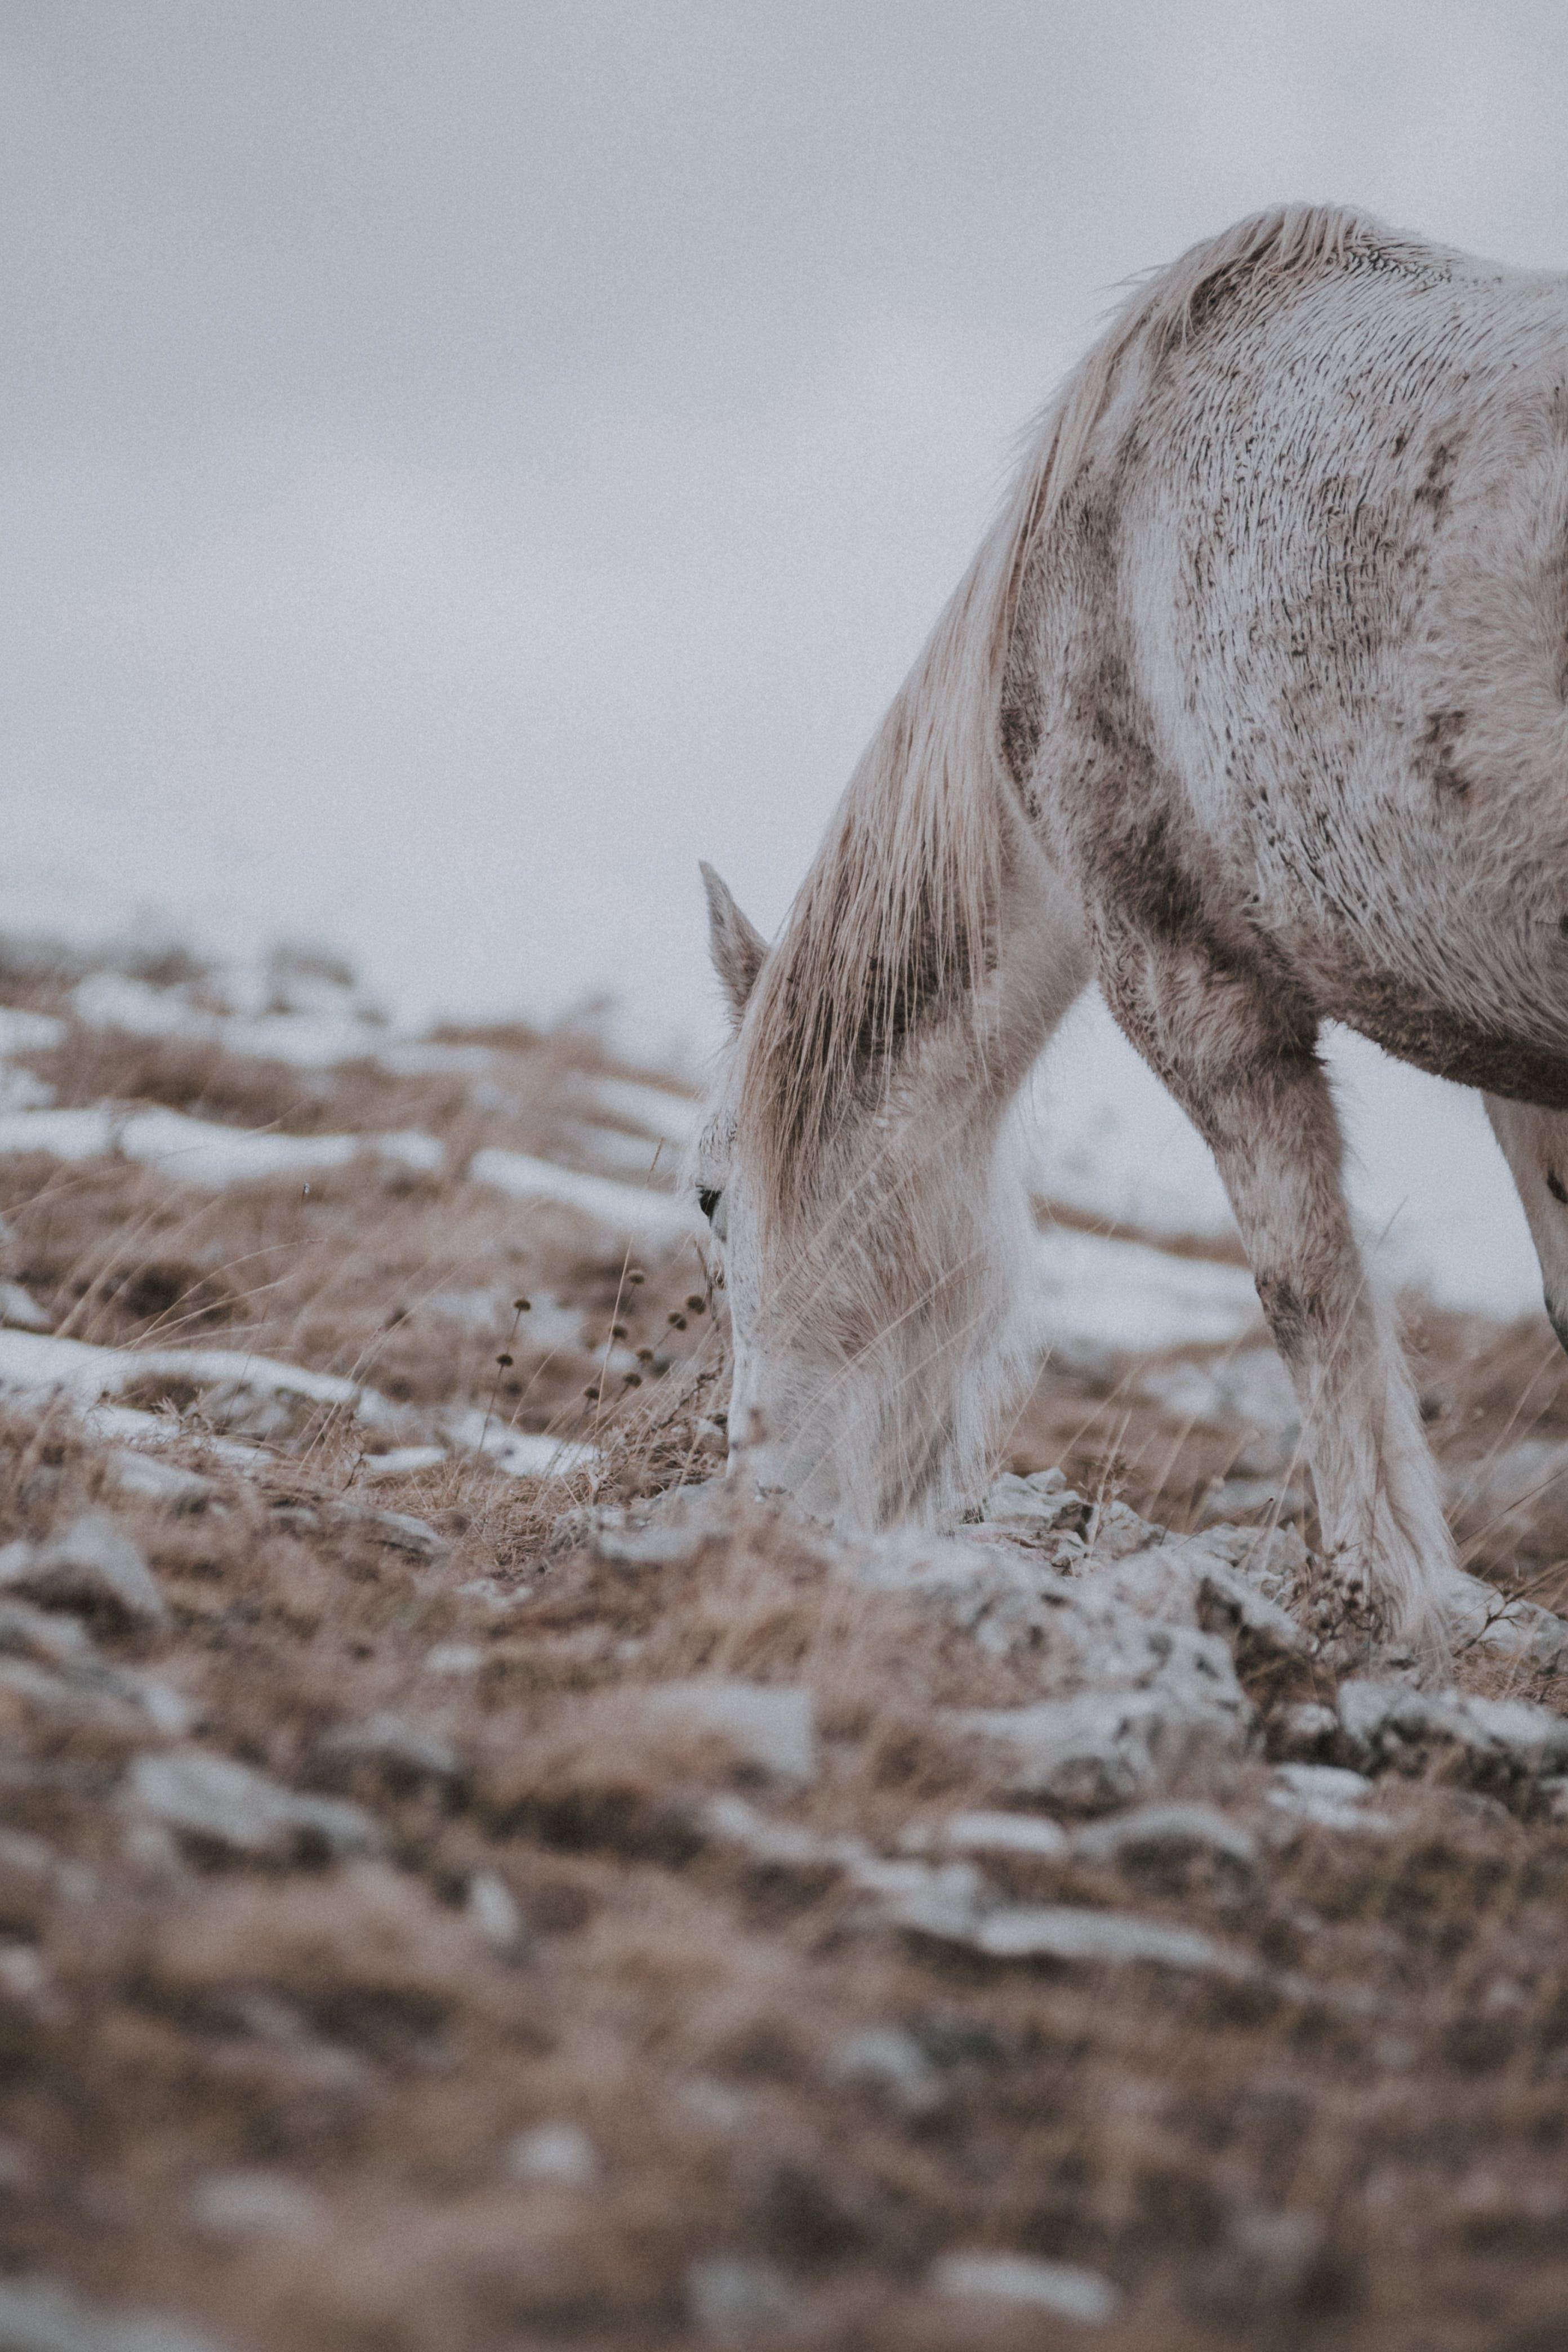 White Horse on Brown Soil